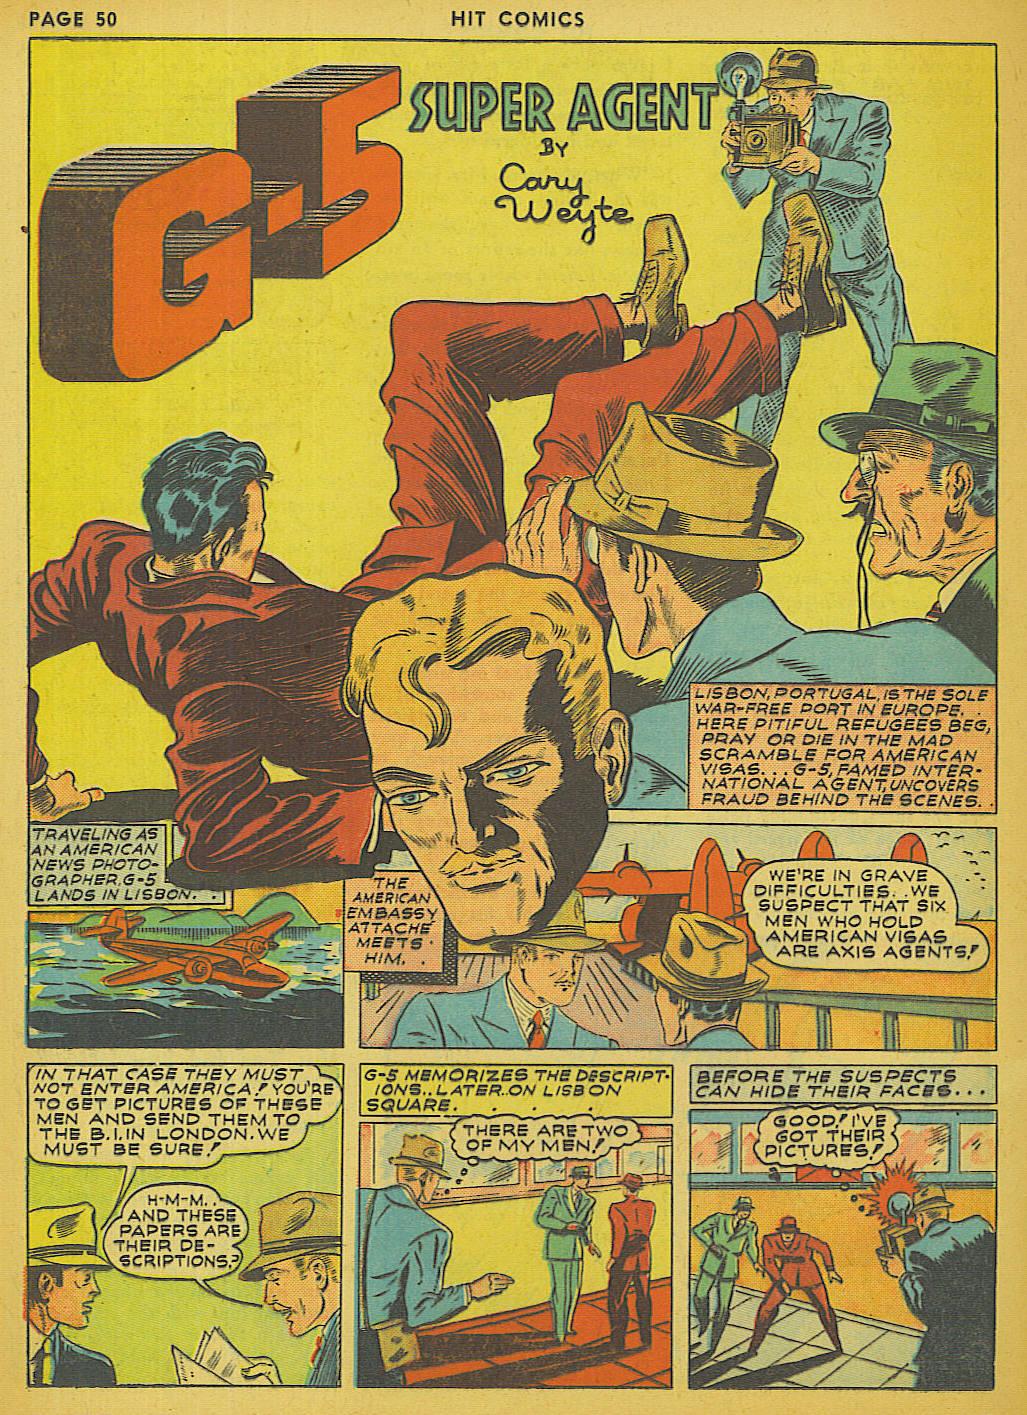 Read online Hit Comics comic -  Issue #13 - 52